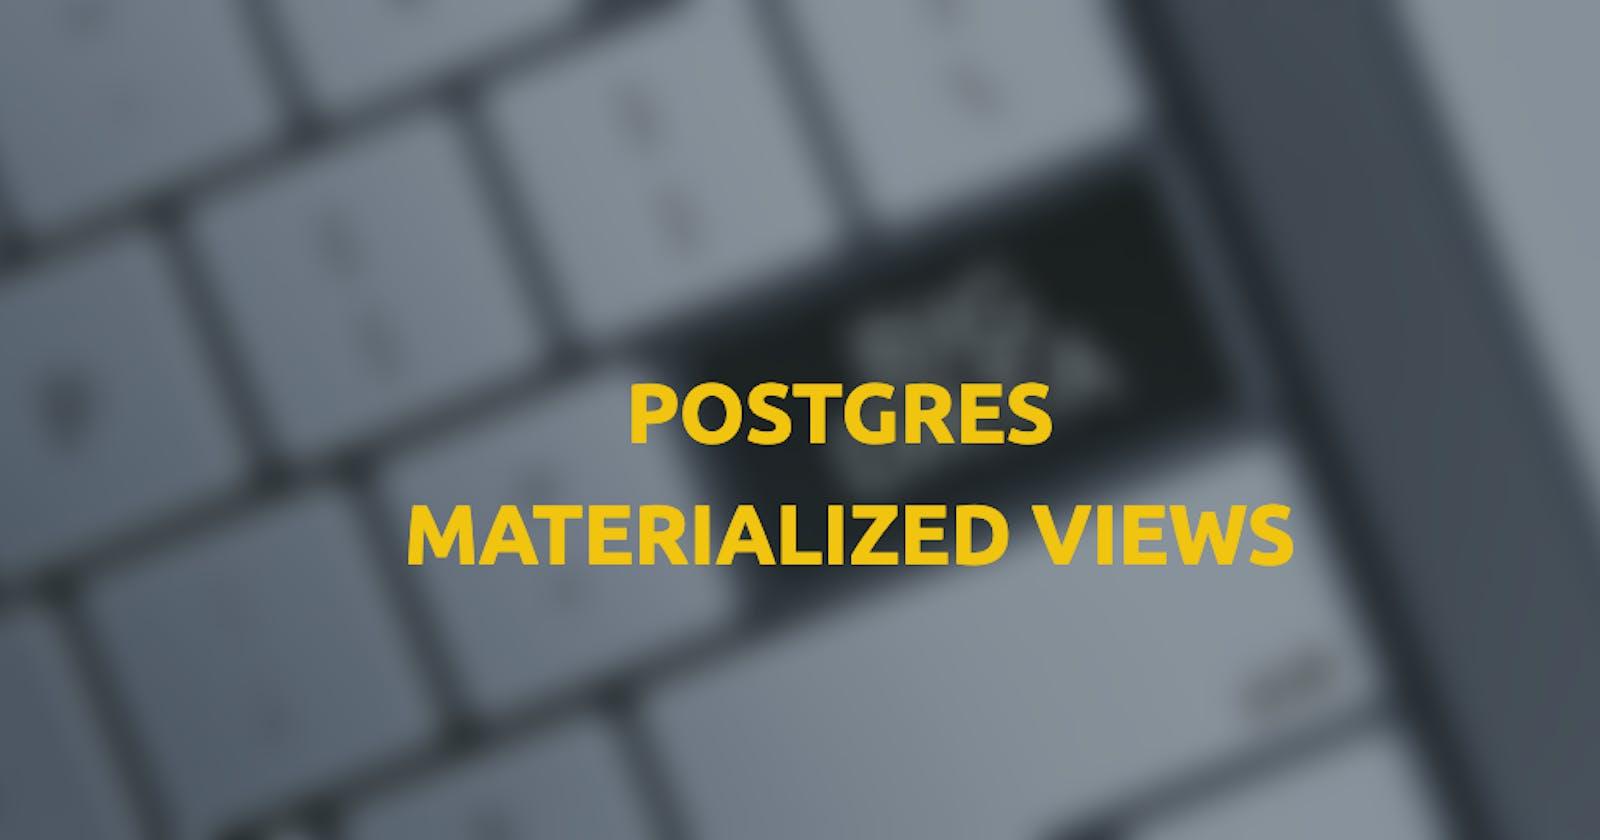 Posgres materialized views